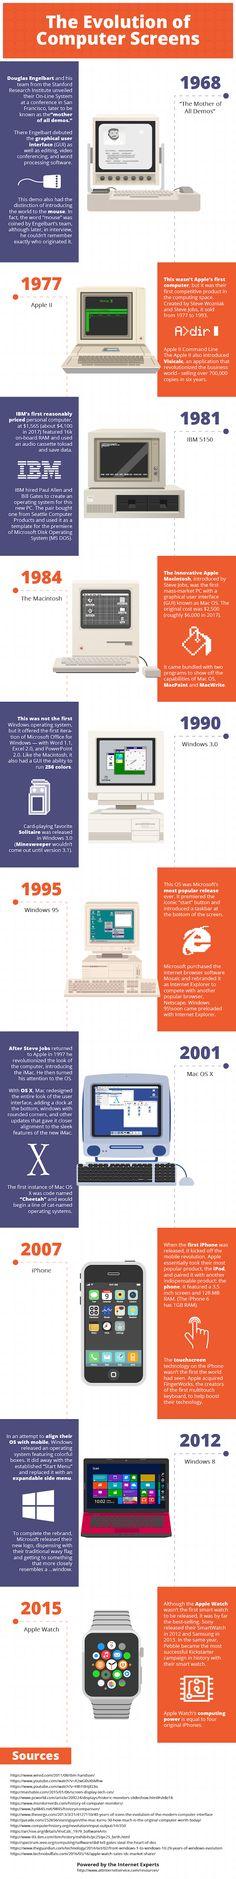 Quit Smoking Timeline Infographic | timeline | Pinterest | Quit ...